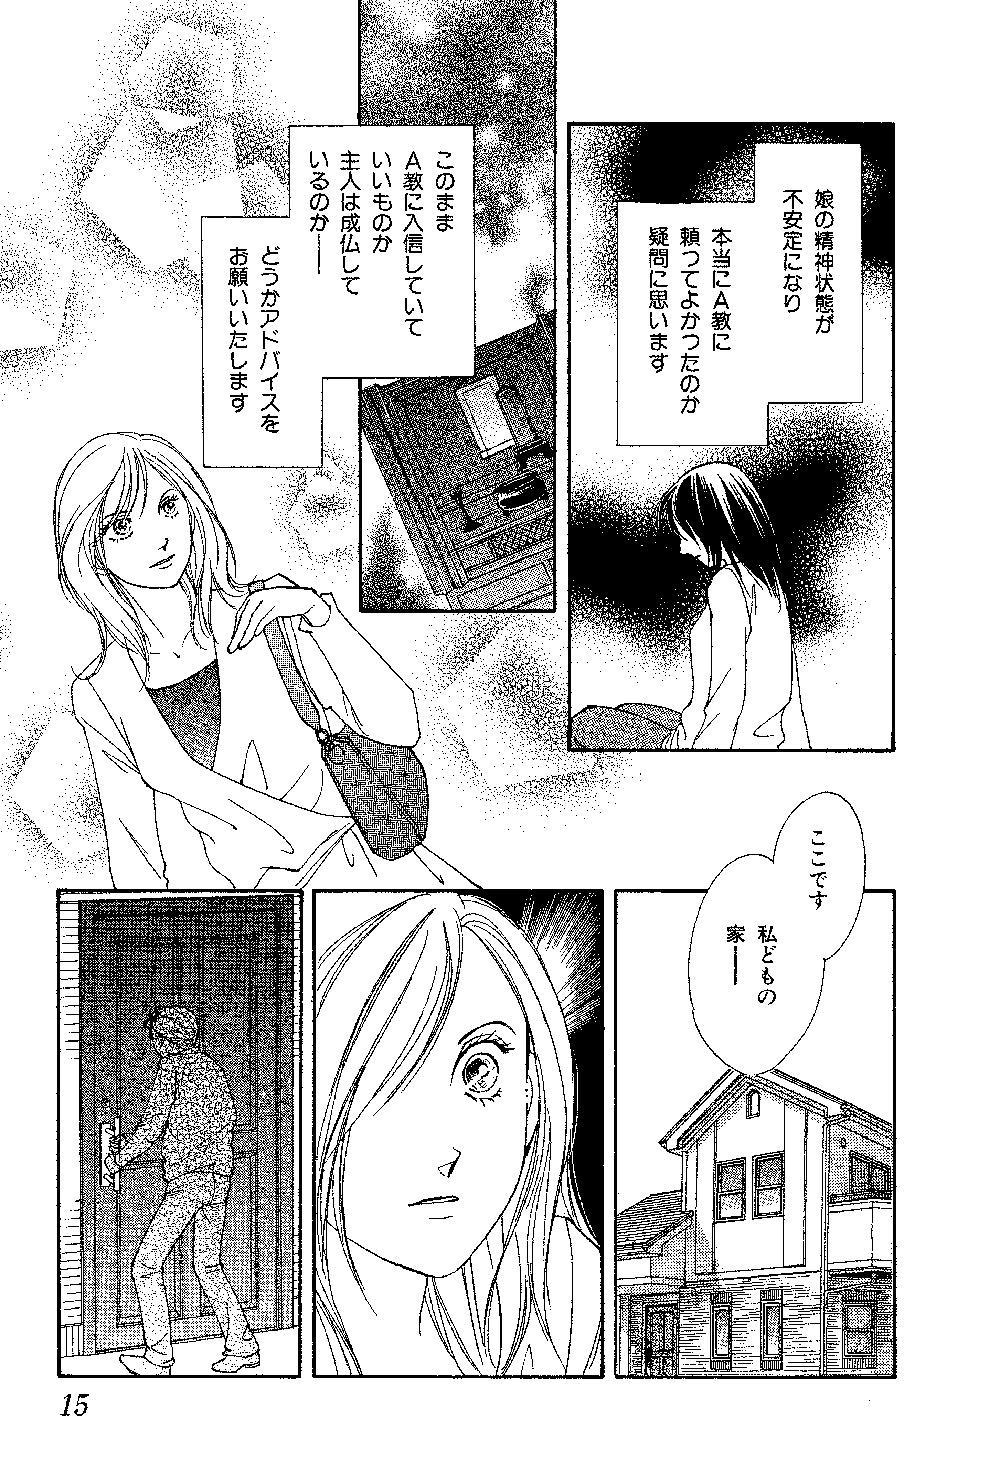 mayuri_0001_0015.jpg